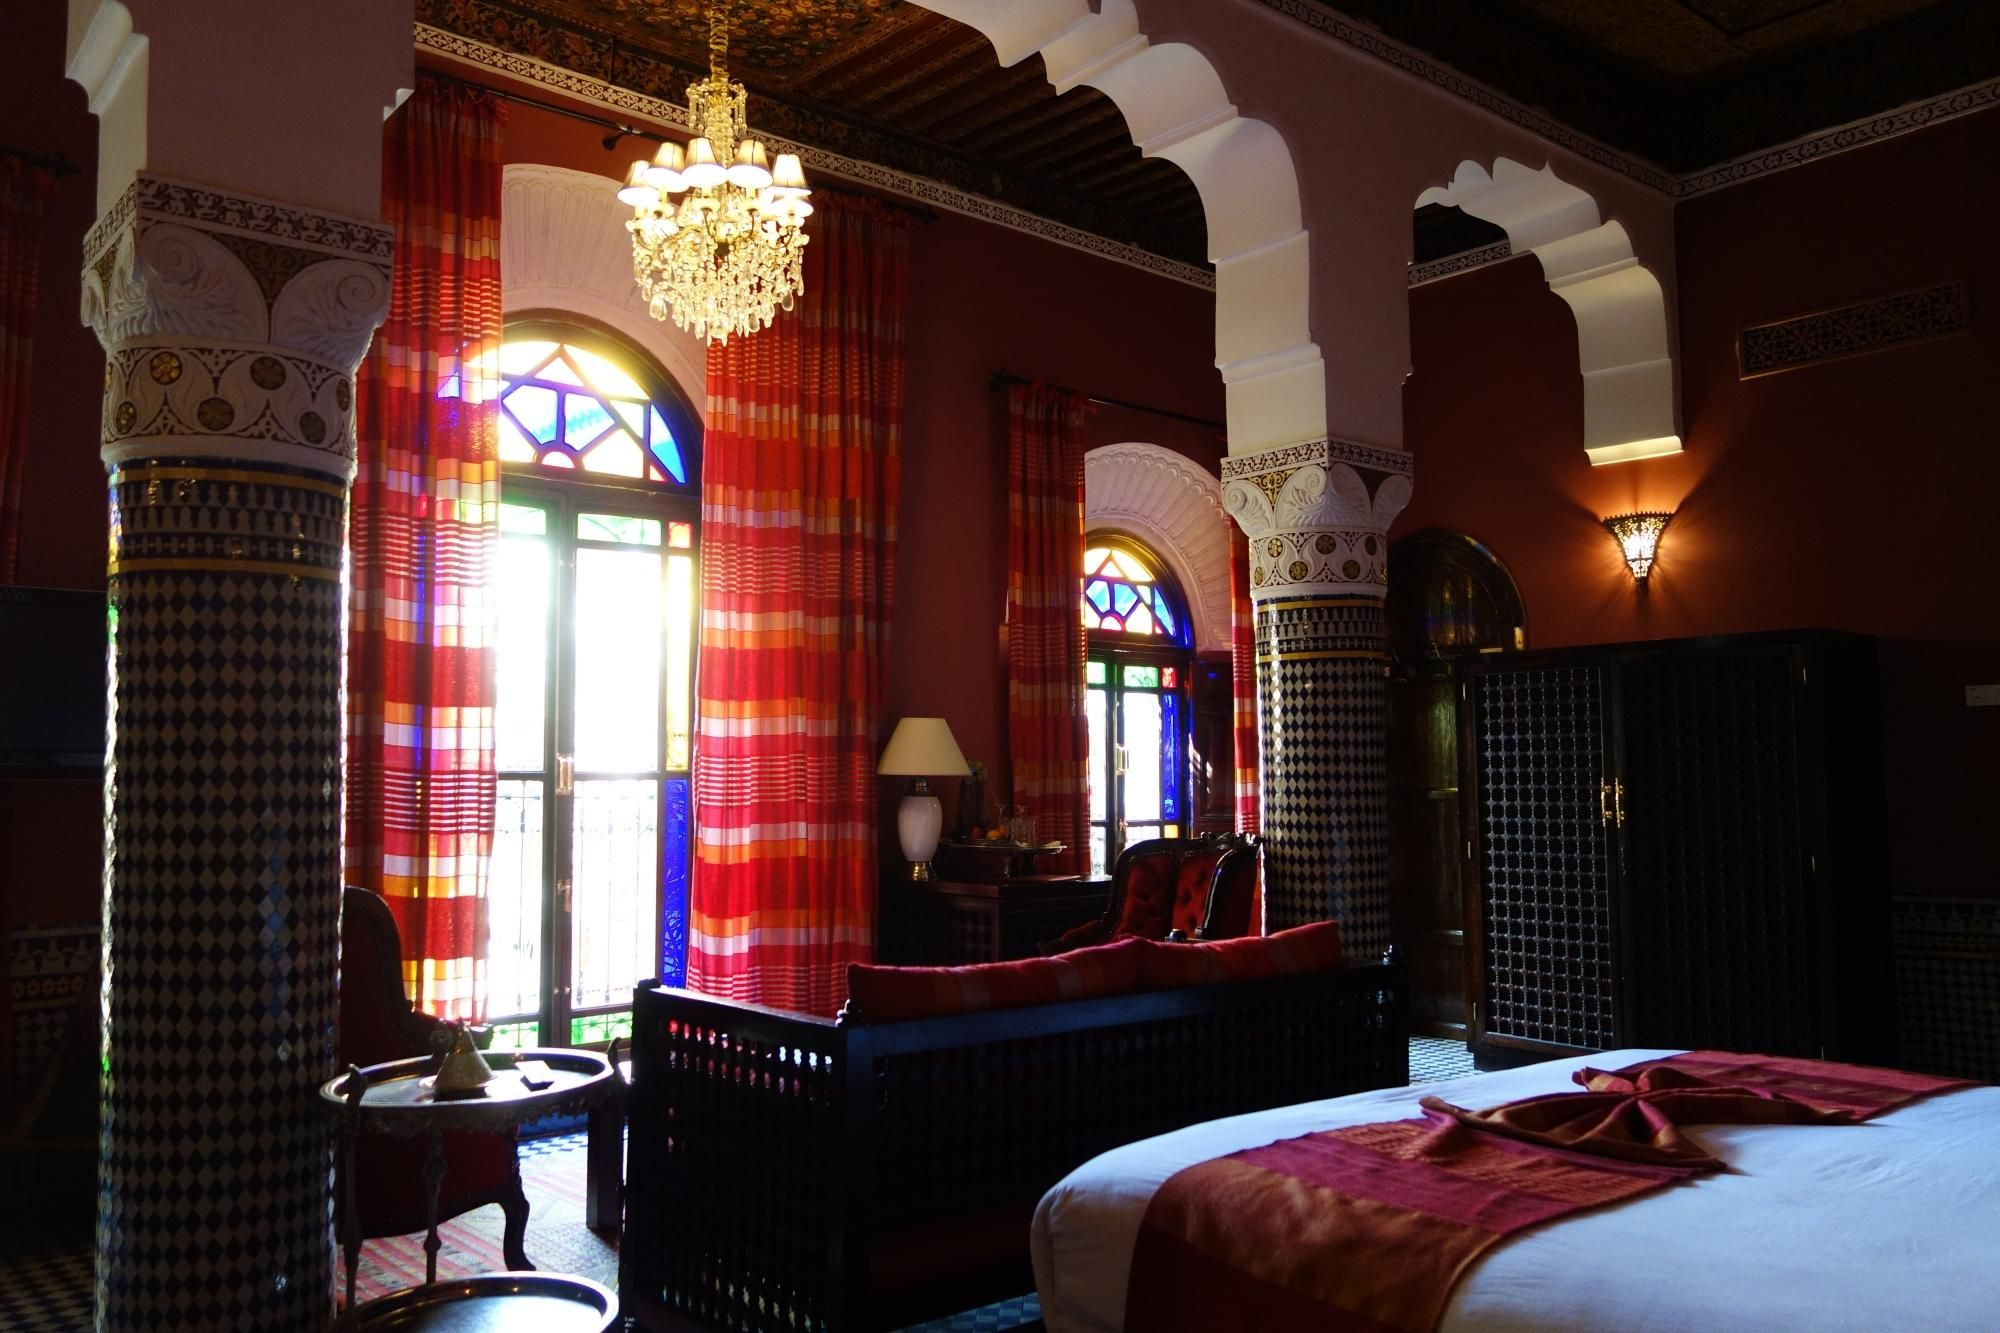 Riad Le Calife (Fes, Morocco) - Hotel Reviews - TripAdvisor